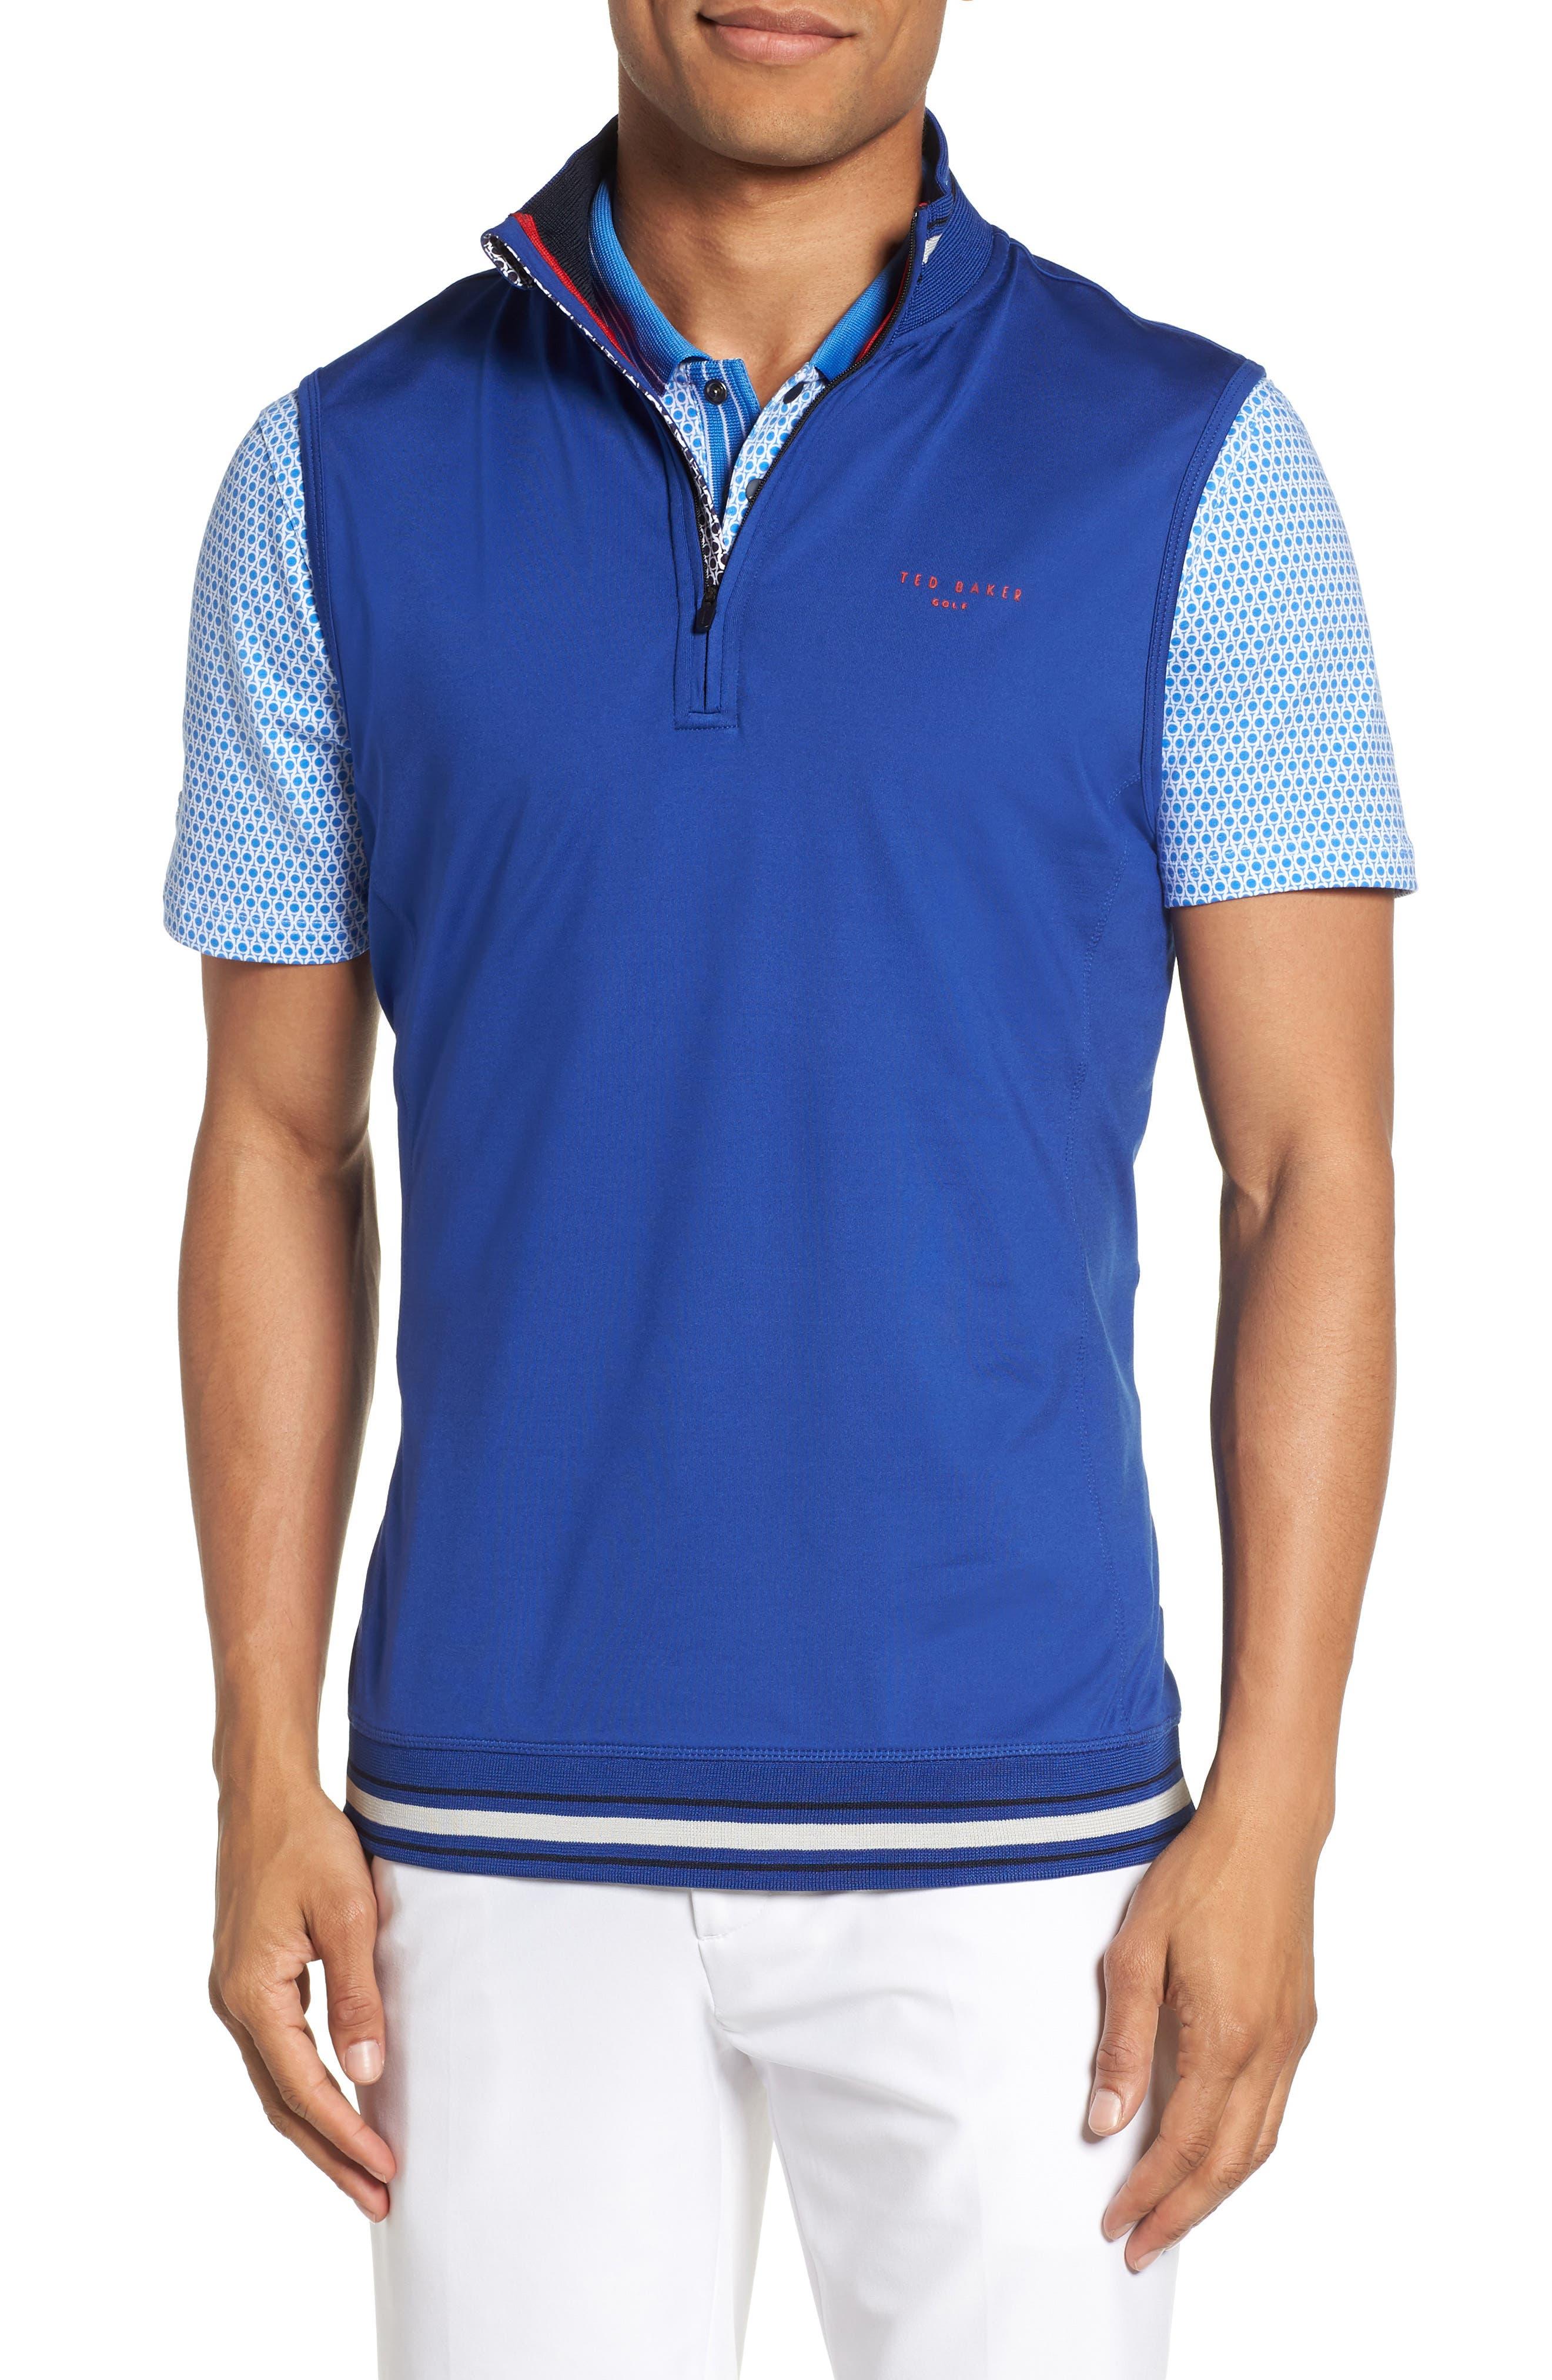 Gala Trim Golf Quarter-Zip Vest,                         Main,                         color, 430